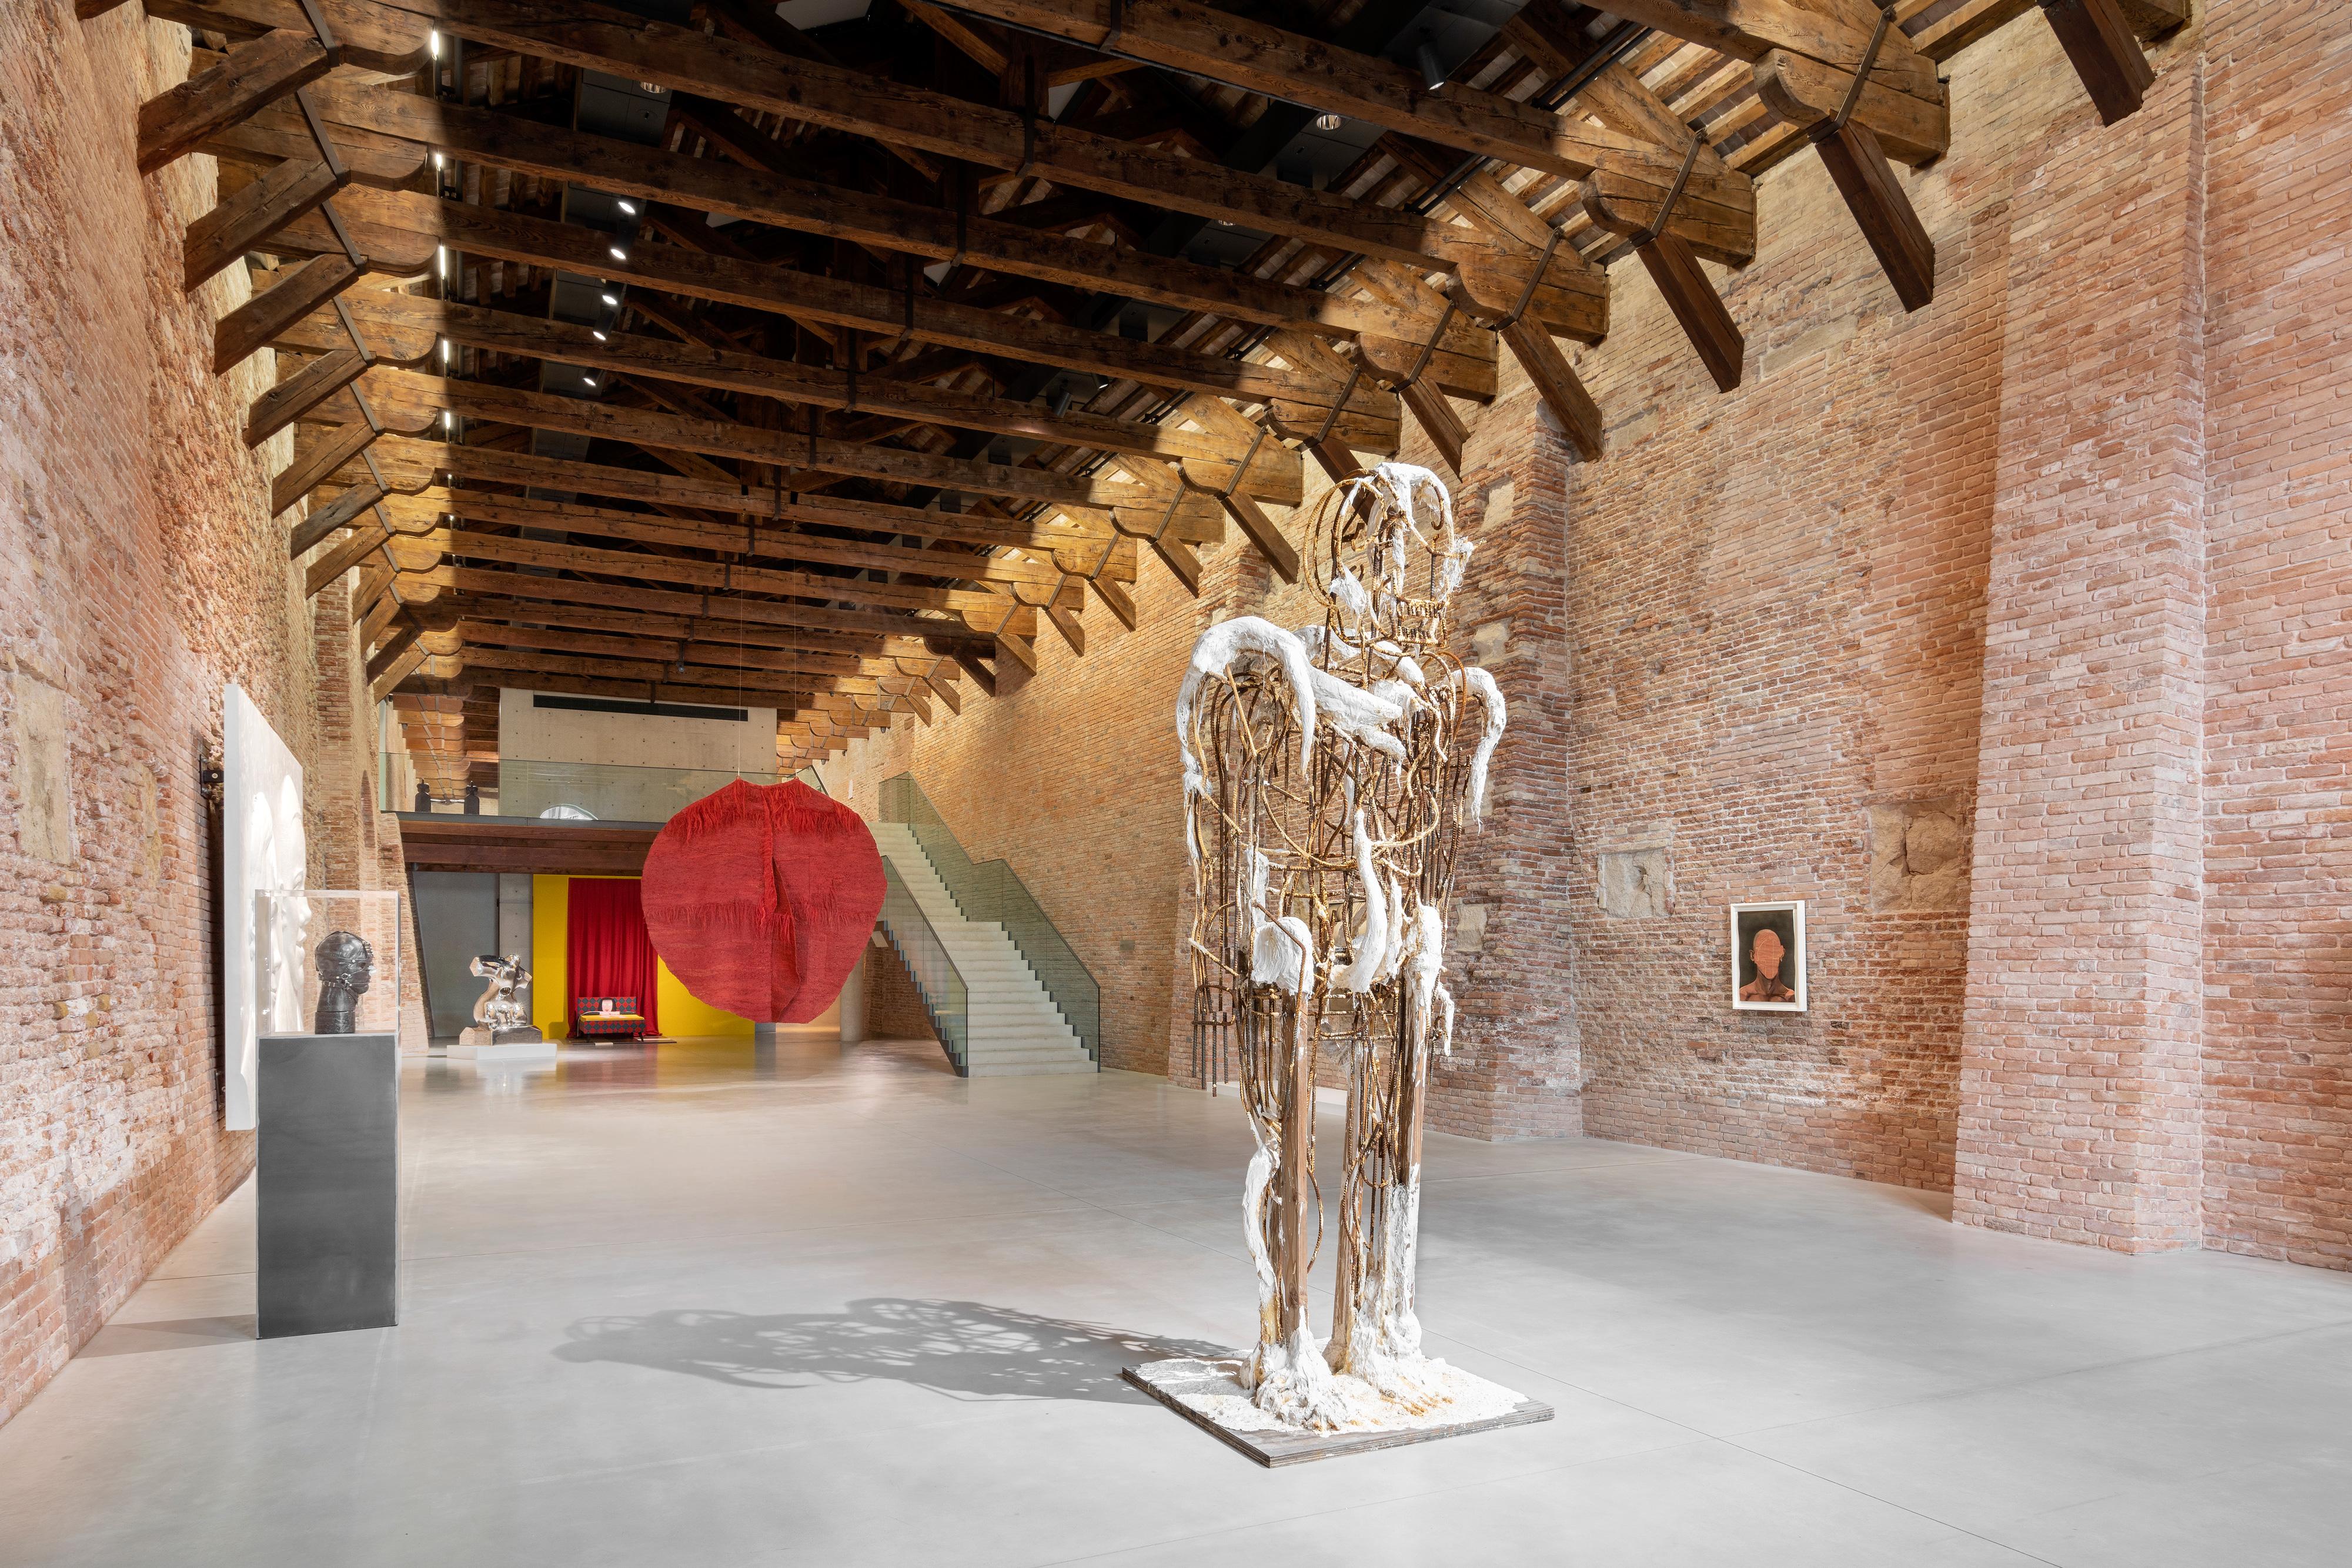 Galerie Barbara Thumm \ Teresa Burga – Untitled. 2020. Three perspectives on the art of the present